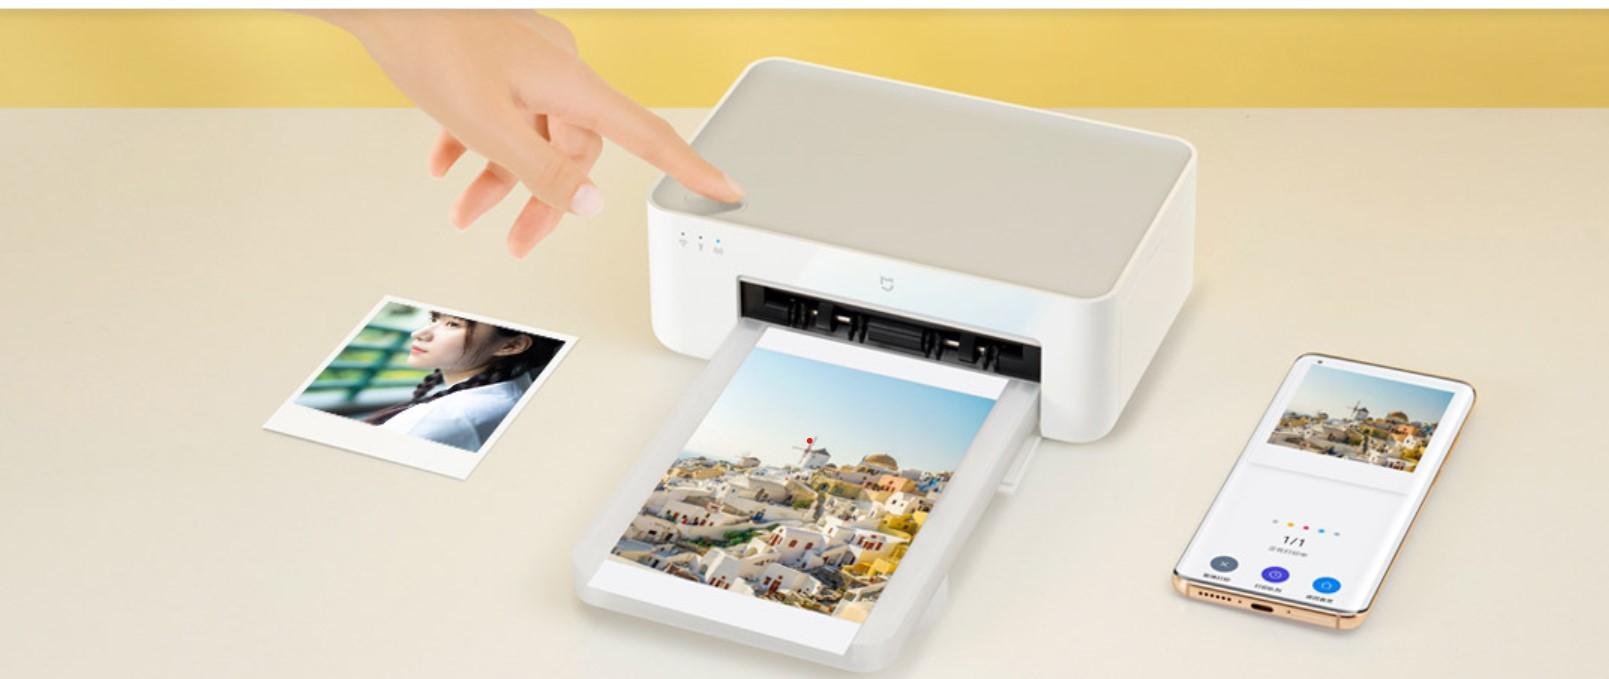 mijia-photo-printer-1s